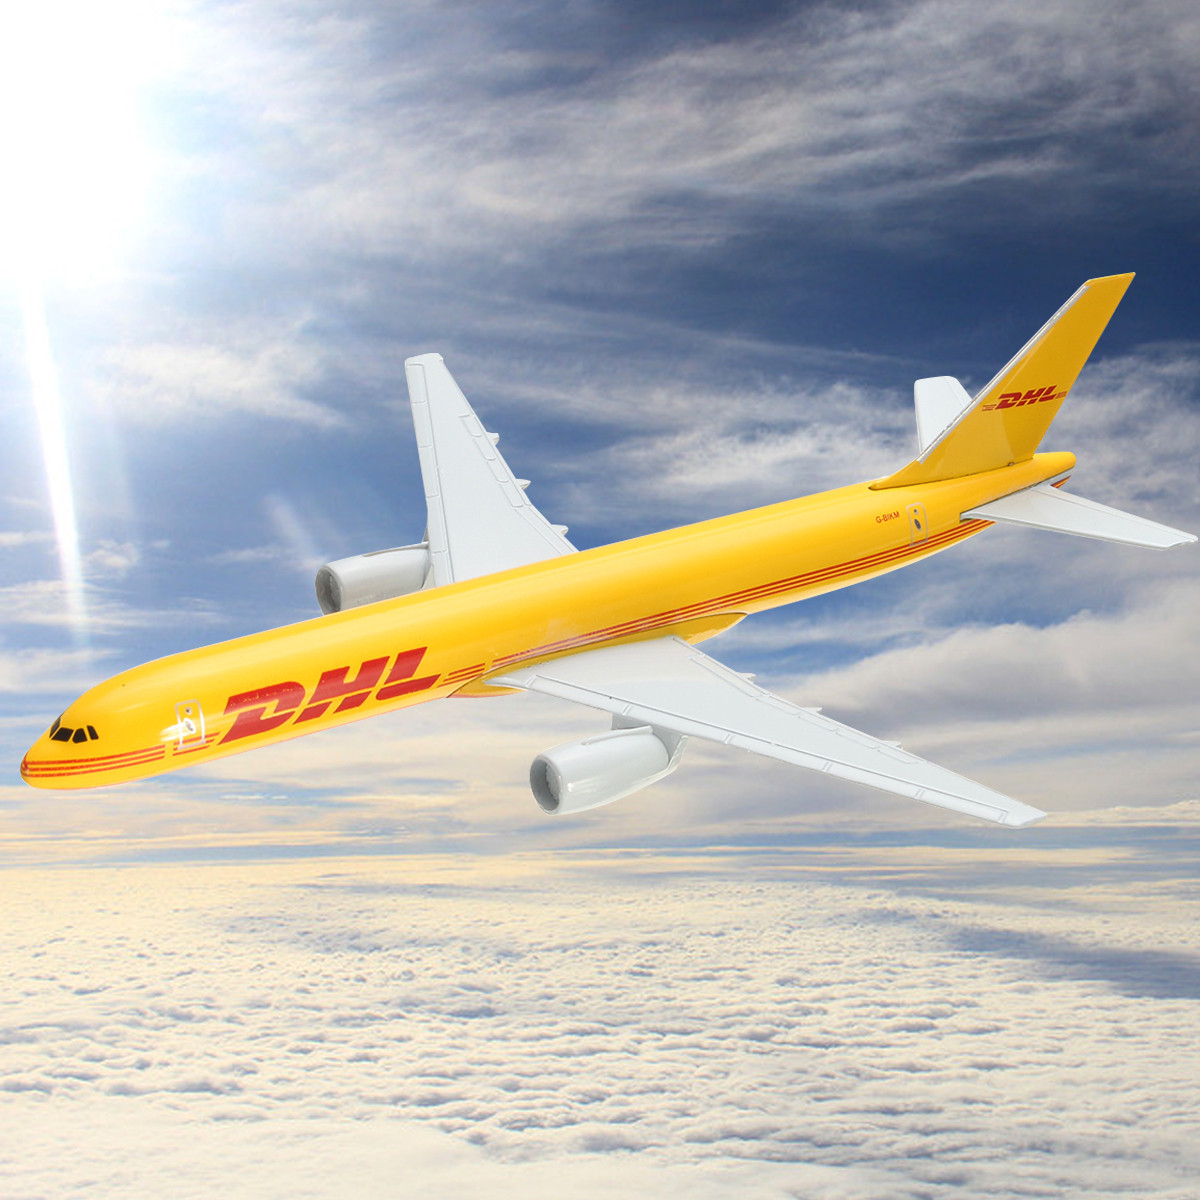 Airplane 16cm Metal Plane Model Aircraft B757 DHL Kargo Aeroplane Scale  Desk Diecast Alloy Toys